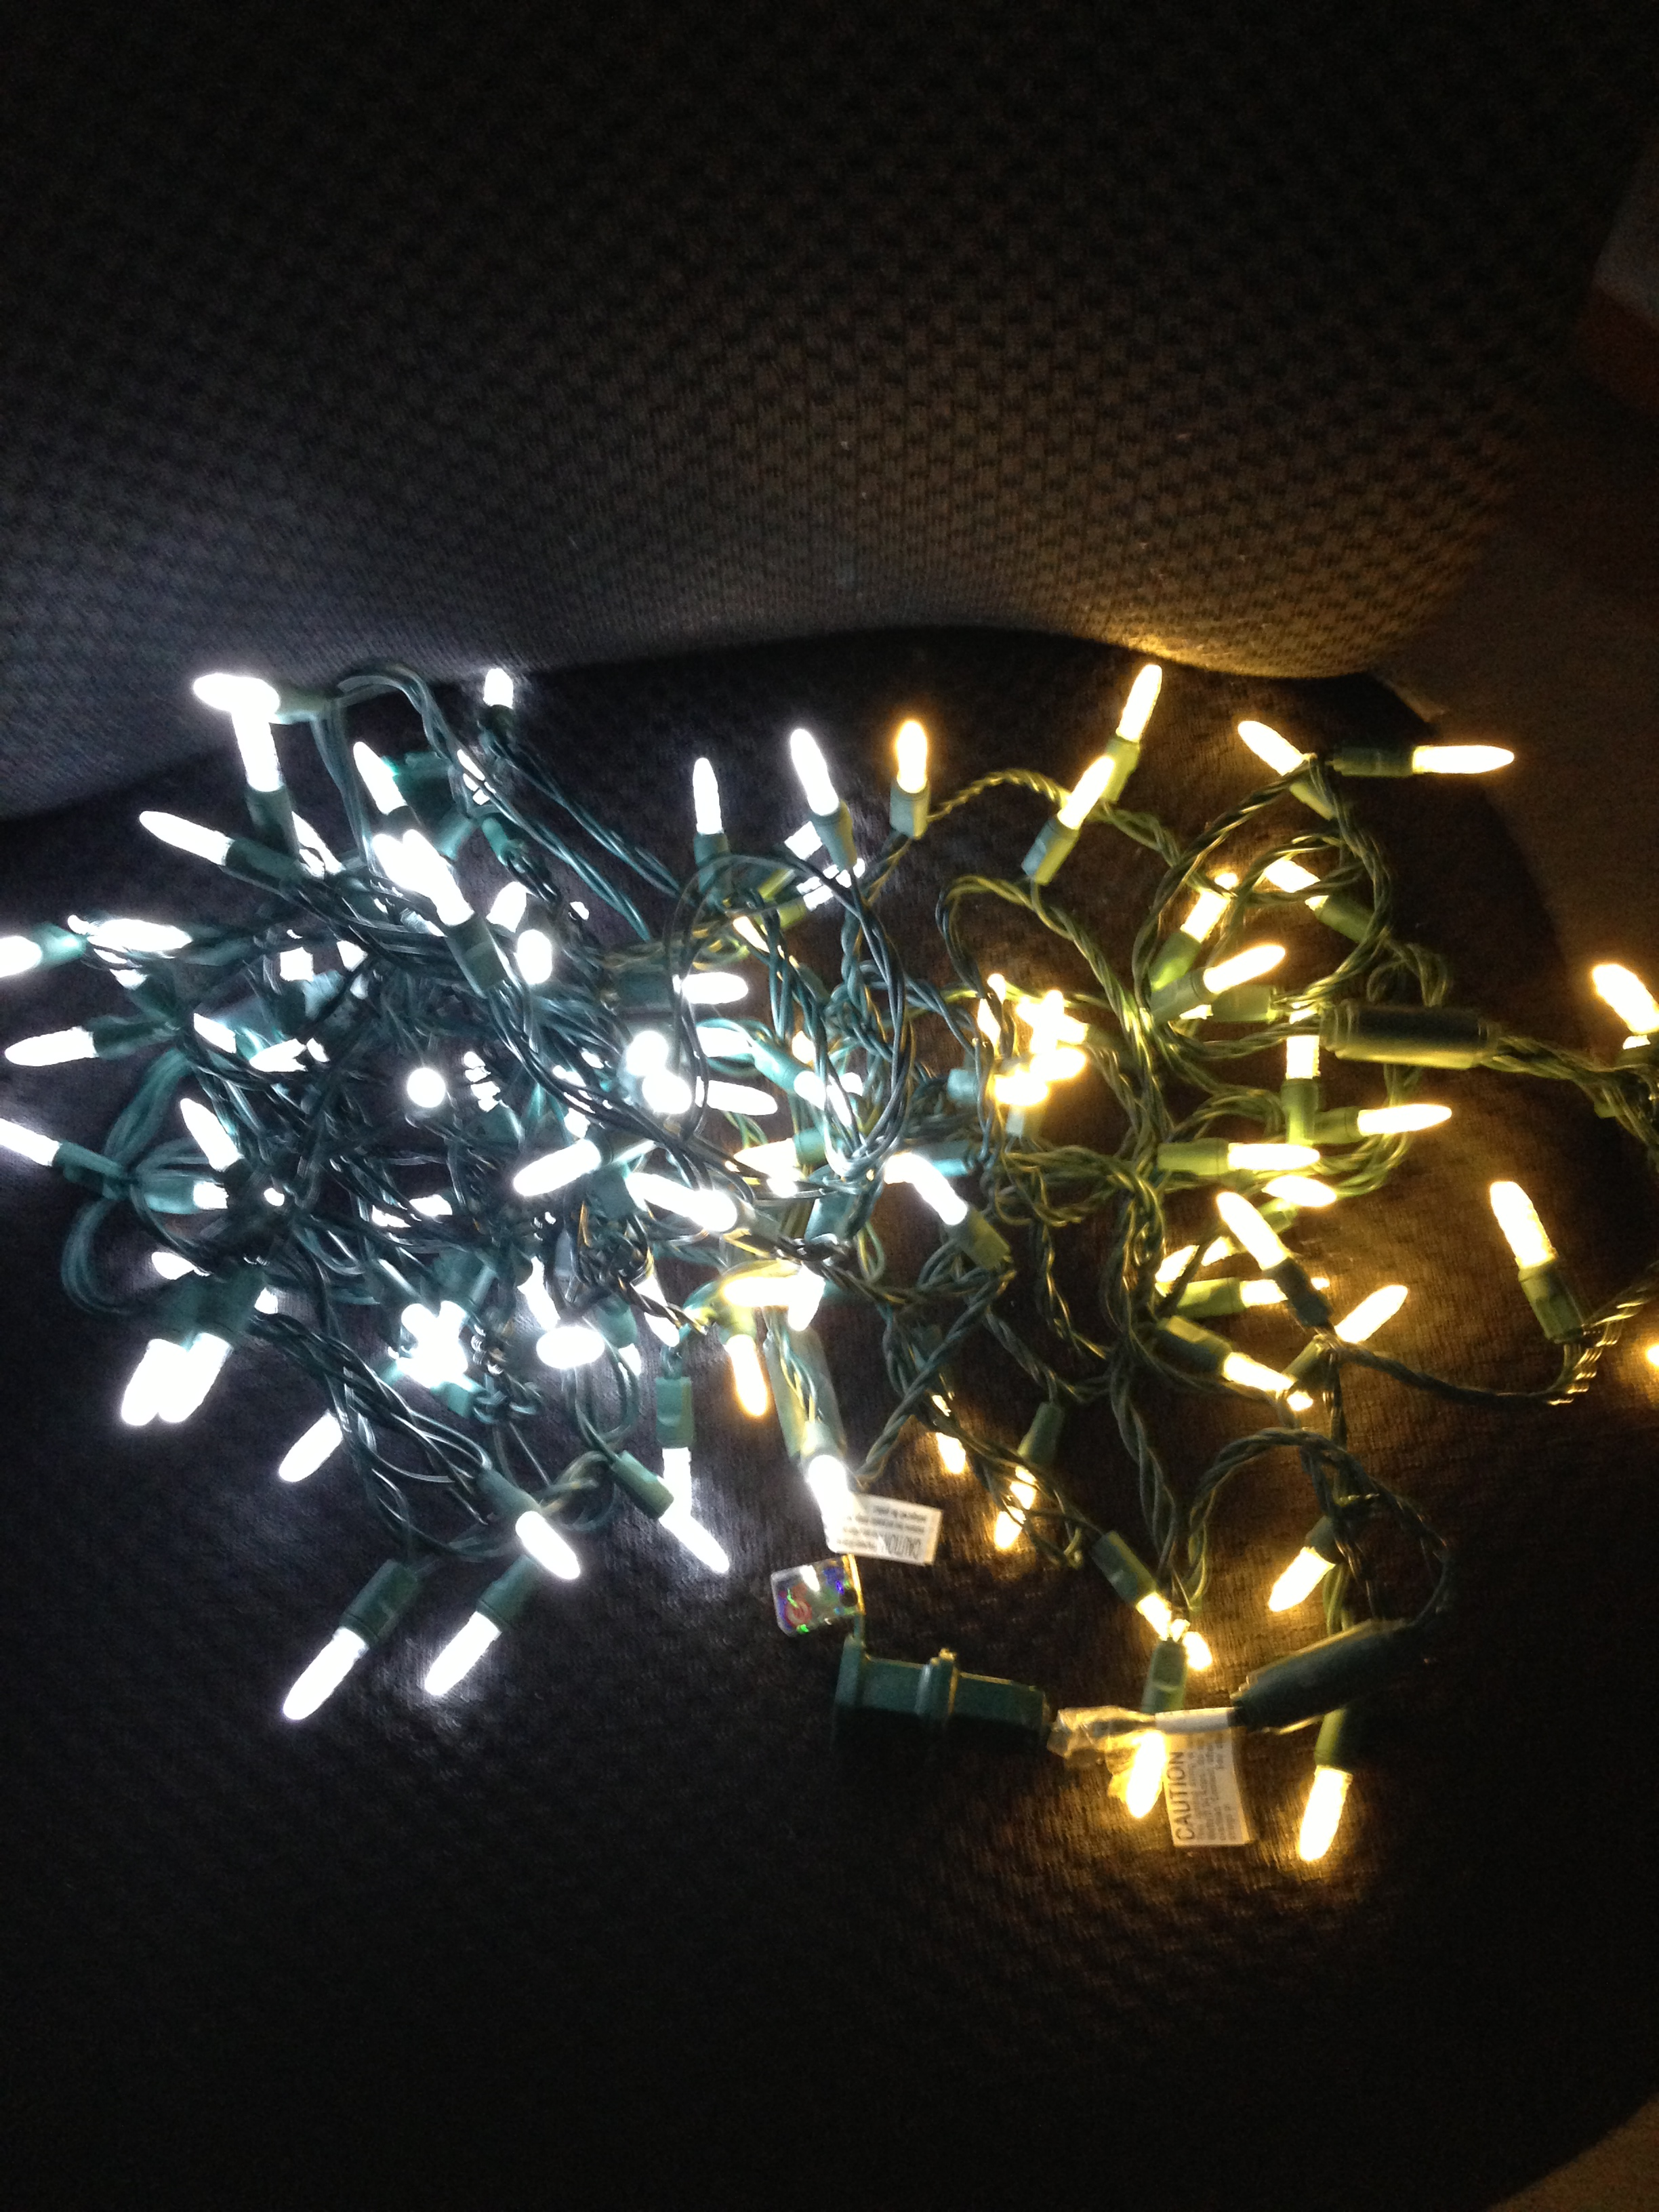 Led Christmas Lights That Look Like Incandescent Christmas